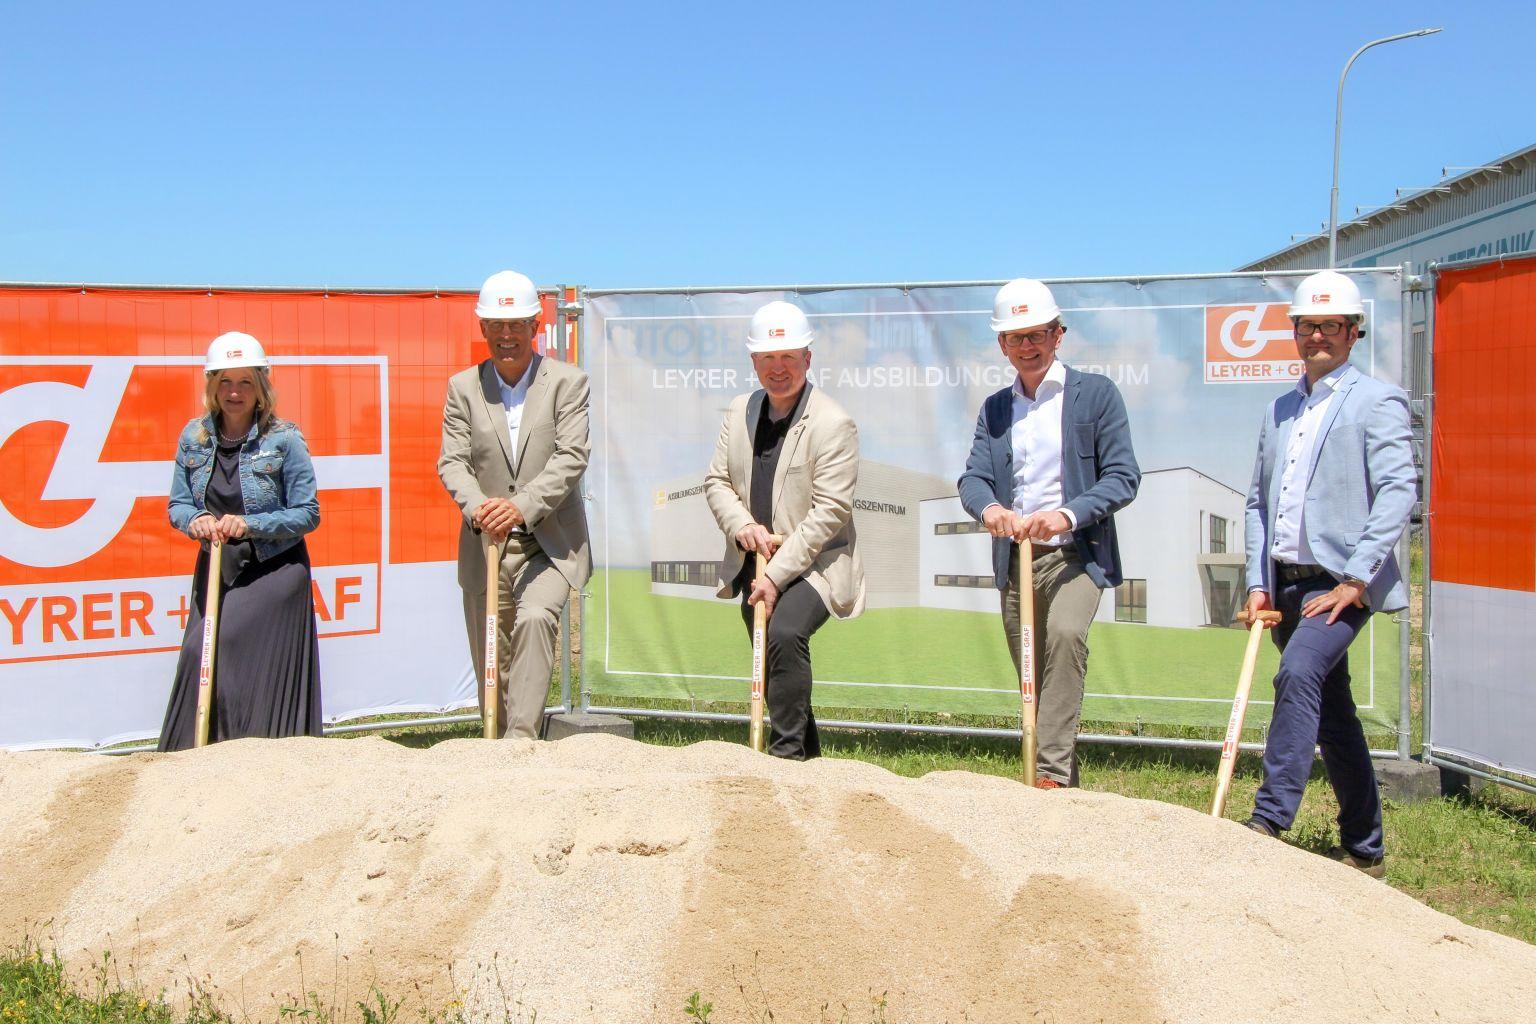 Offizieller Baustart für Leyrer + Graf Ausbildungszentrum